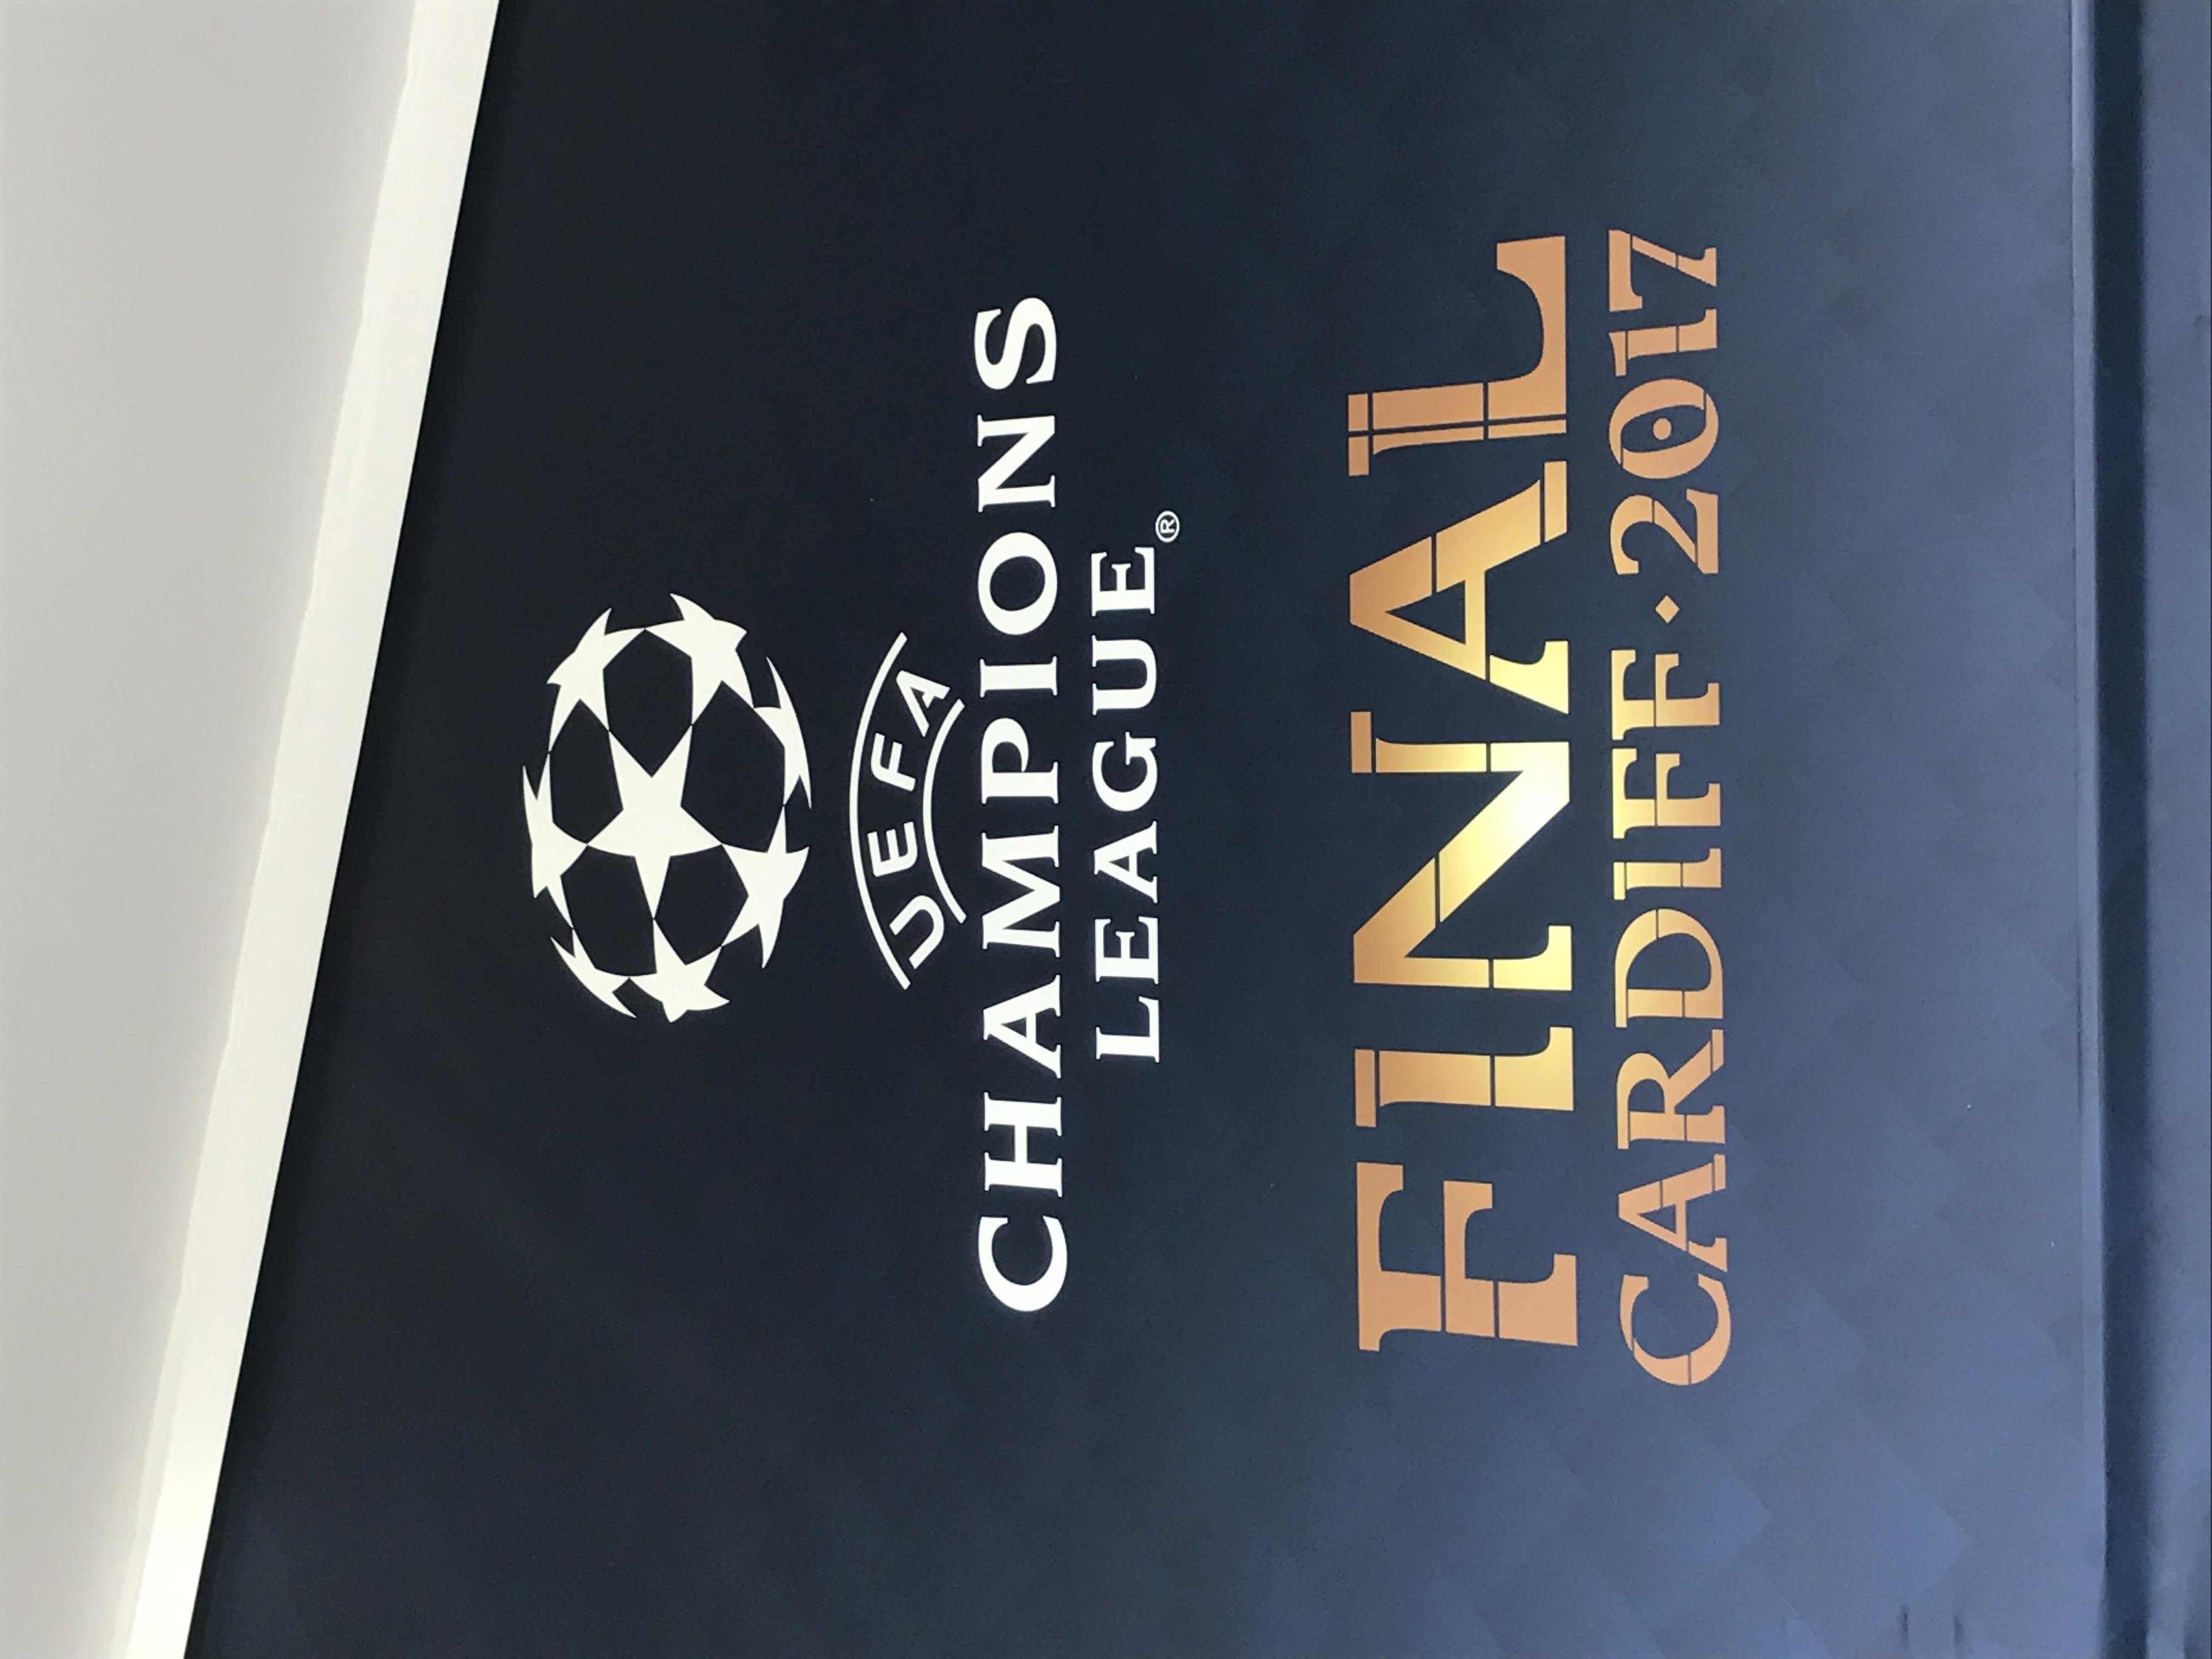 UEFA display 2017